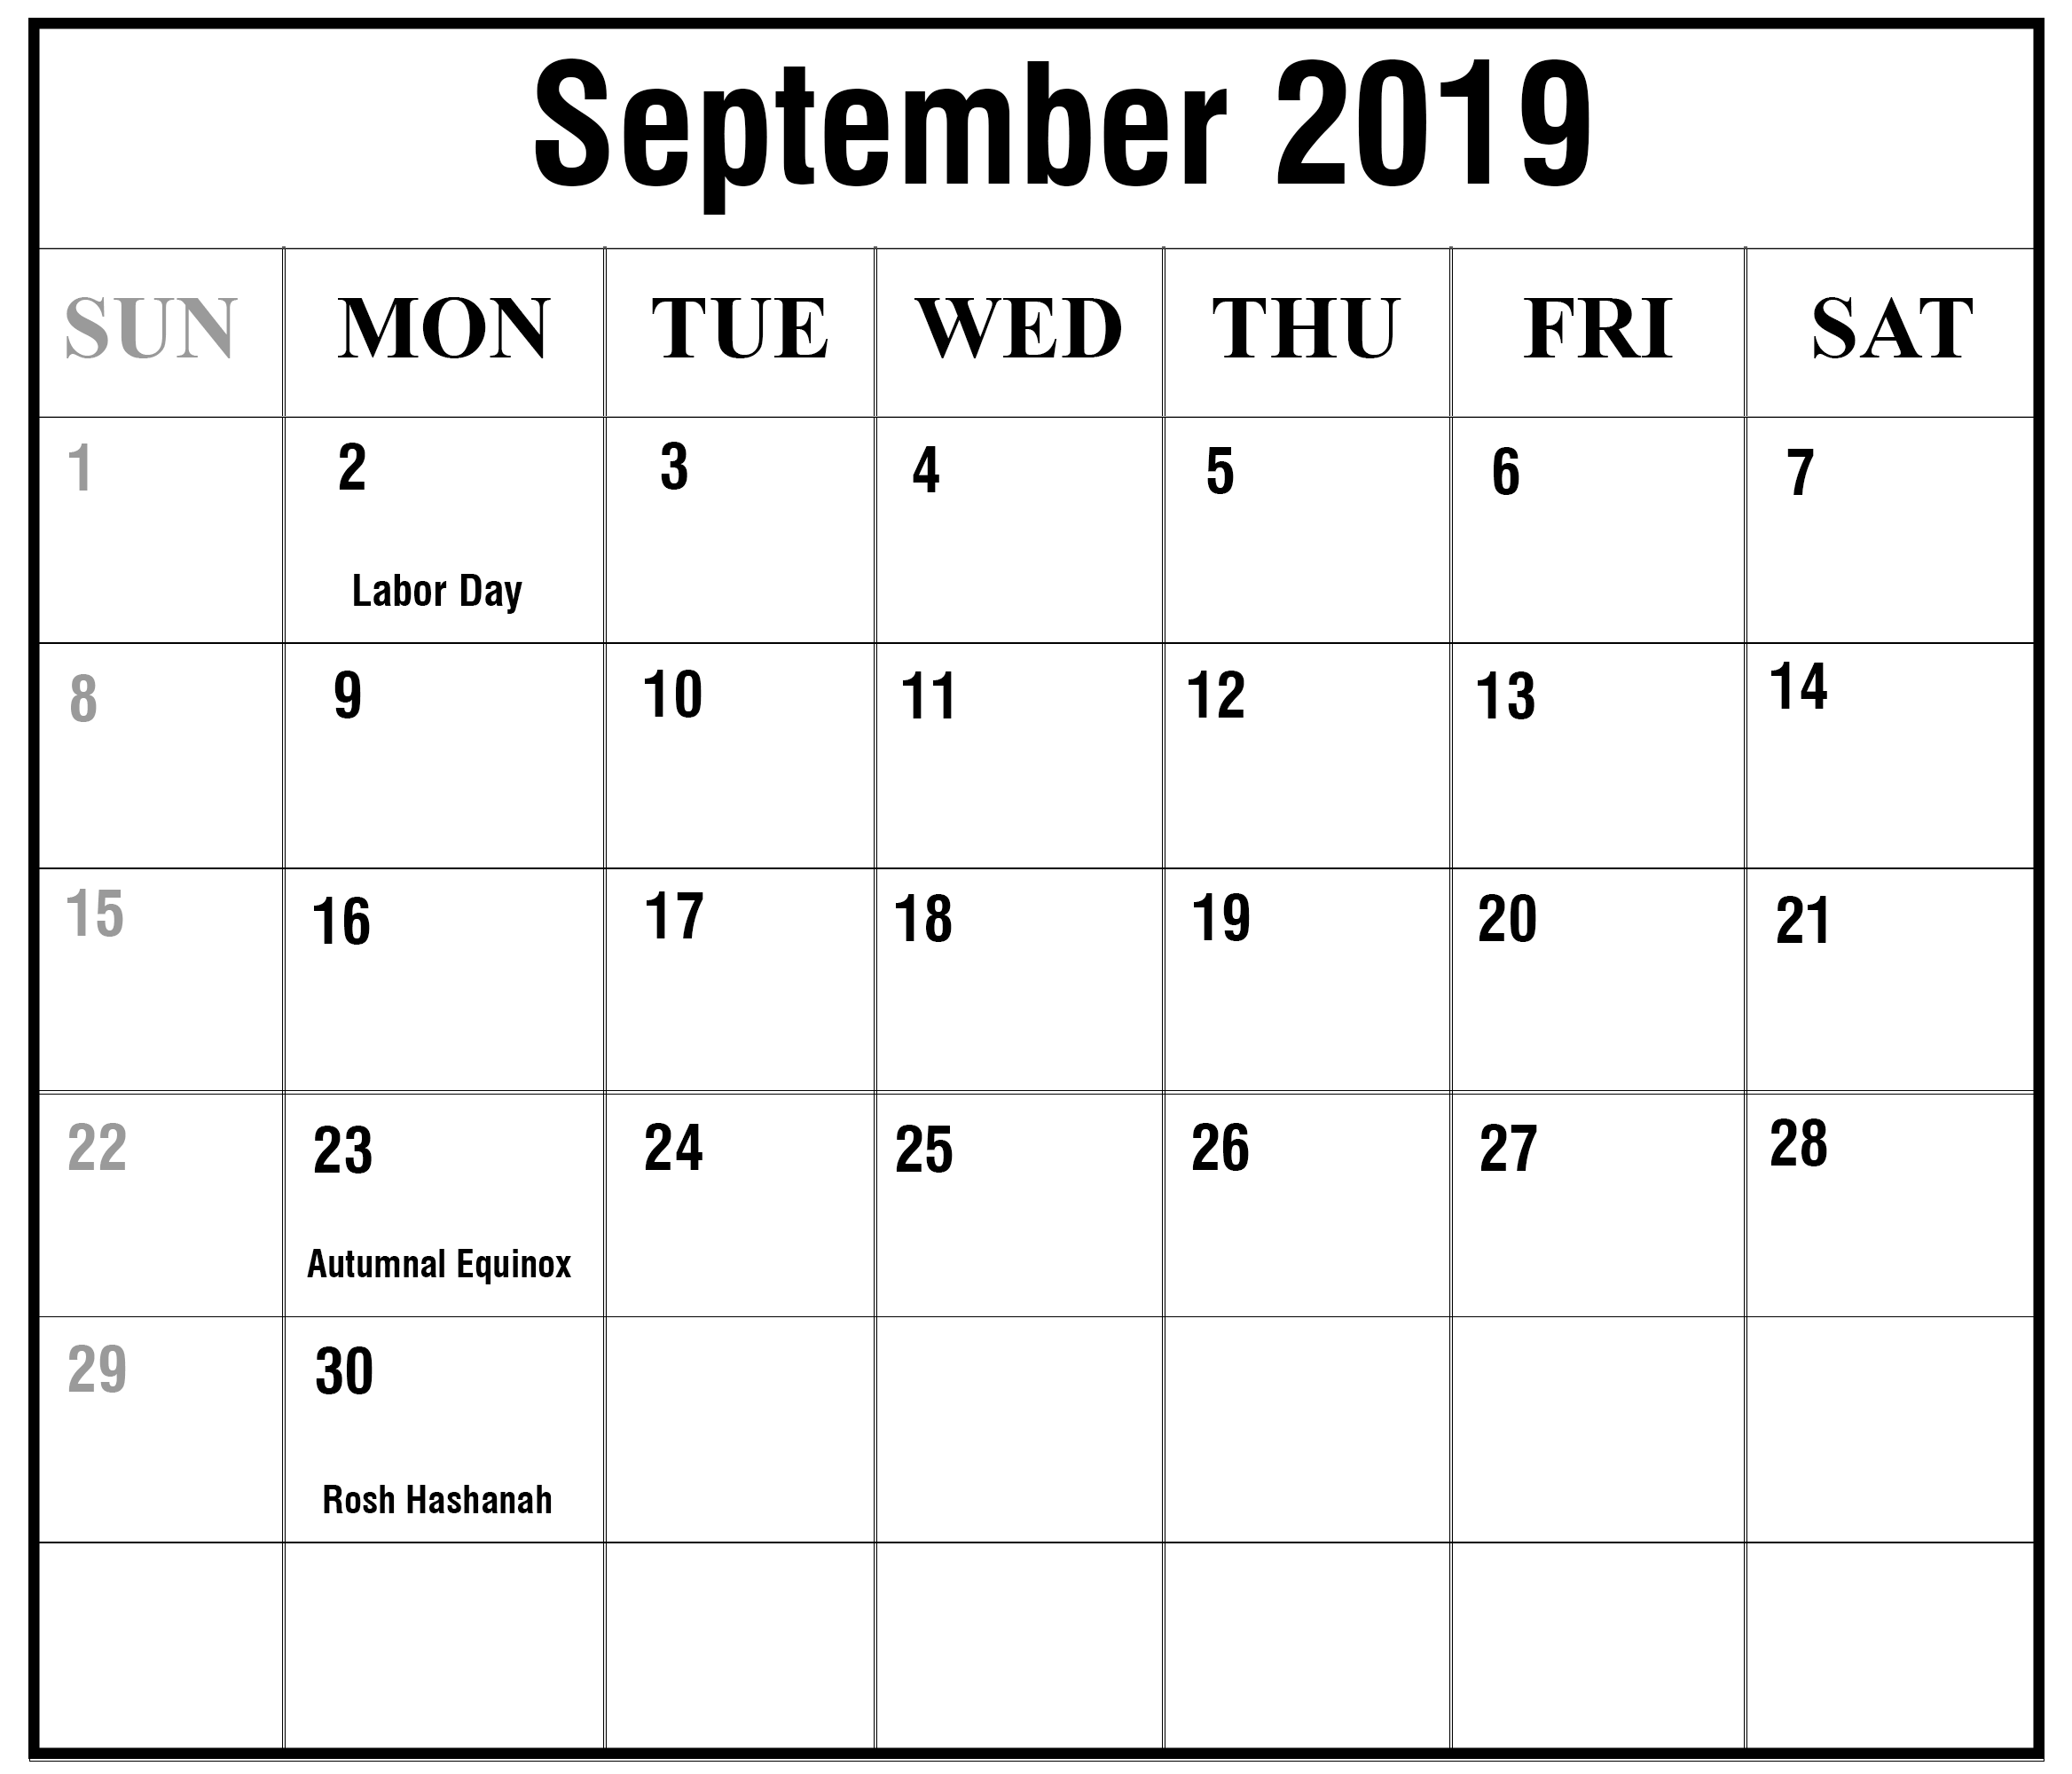 September 2019 Calendar Blank Template